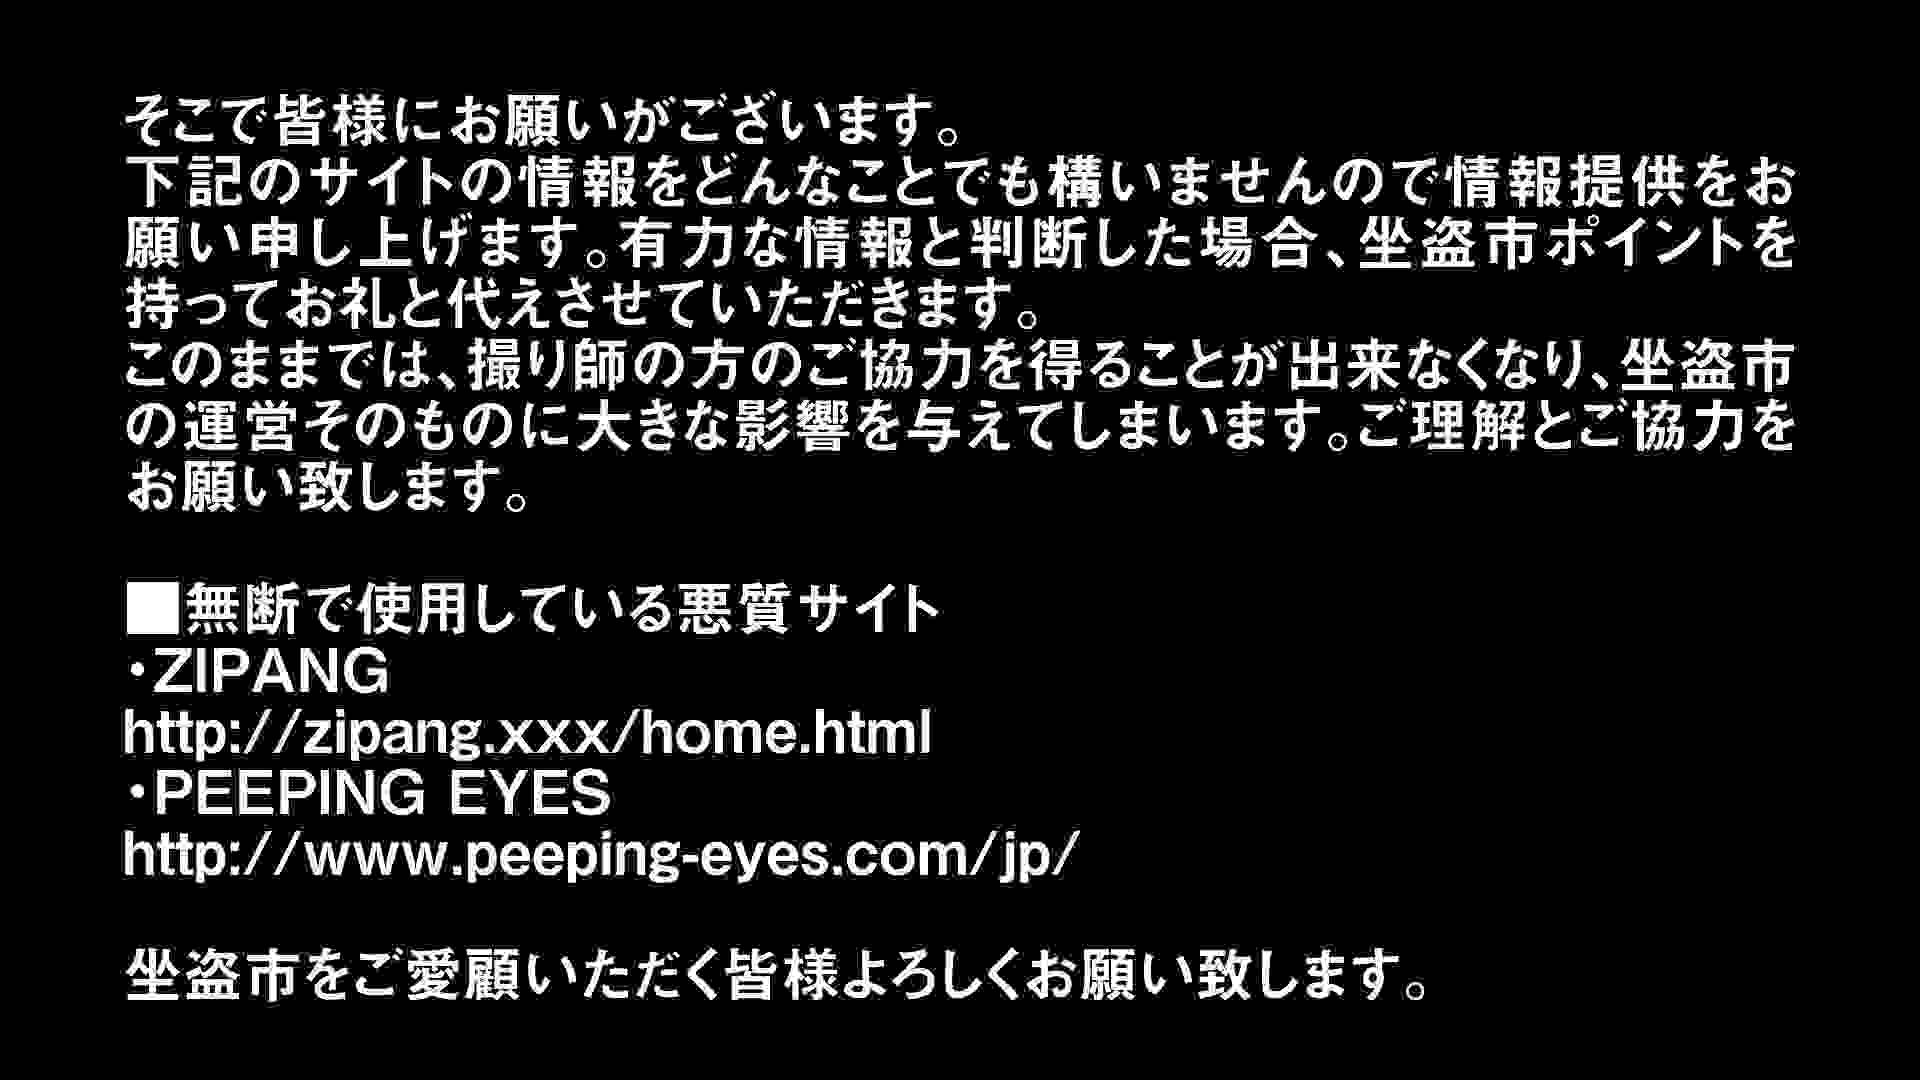 Aquaな露天風呂Vol.296 盗撮 | OLセックス  91画像 43